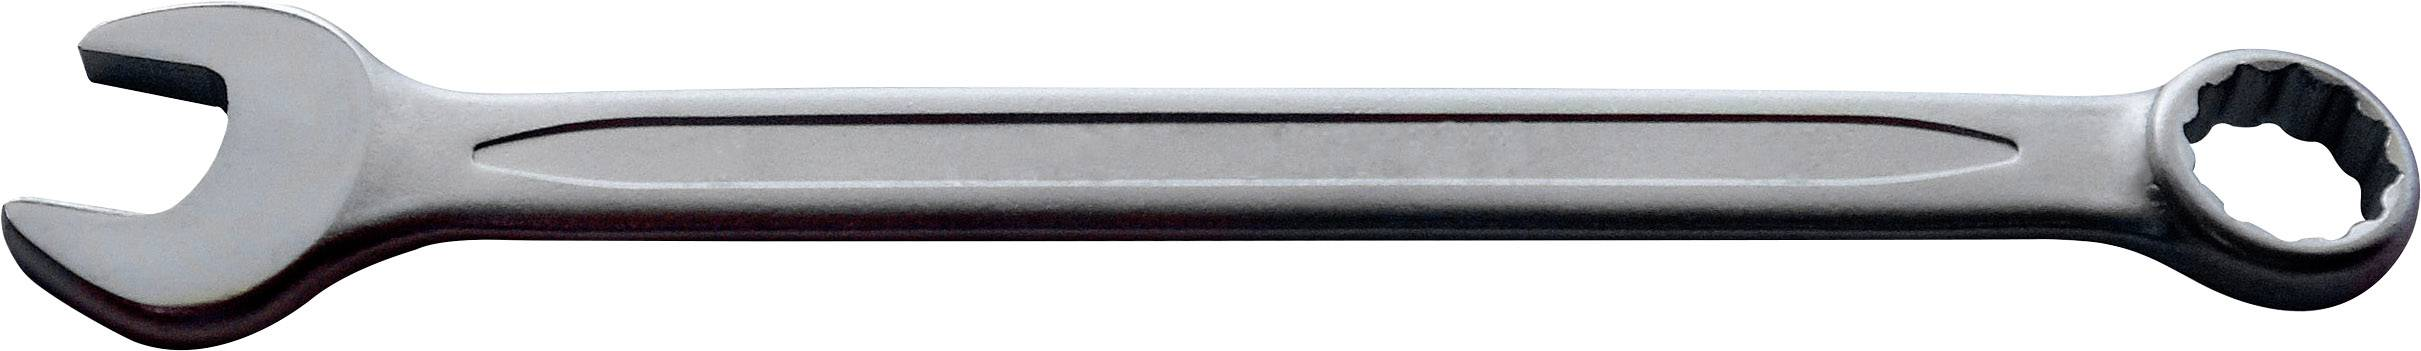 Očkoplochý kľúč/e TOOLCRAFT 820837, 14 mm